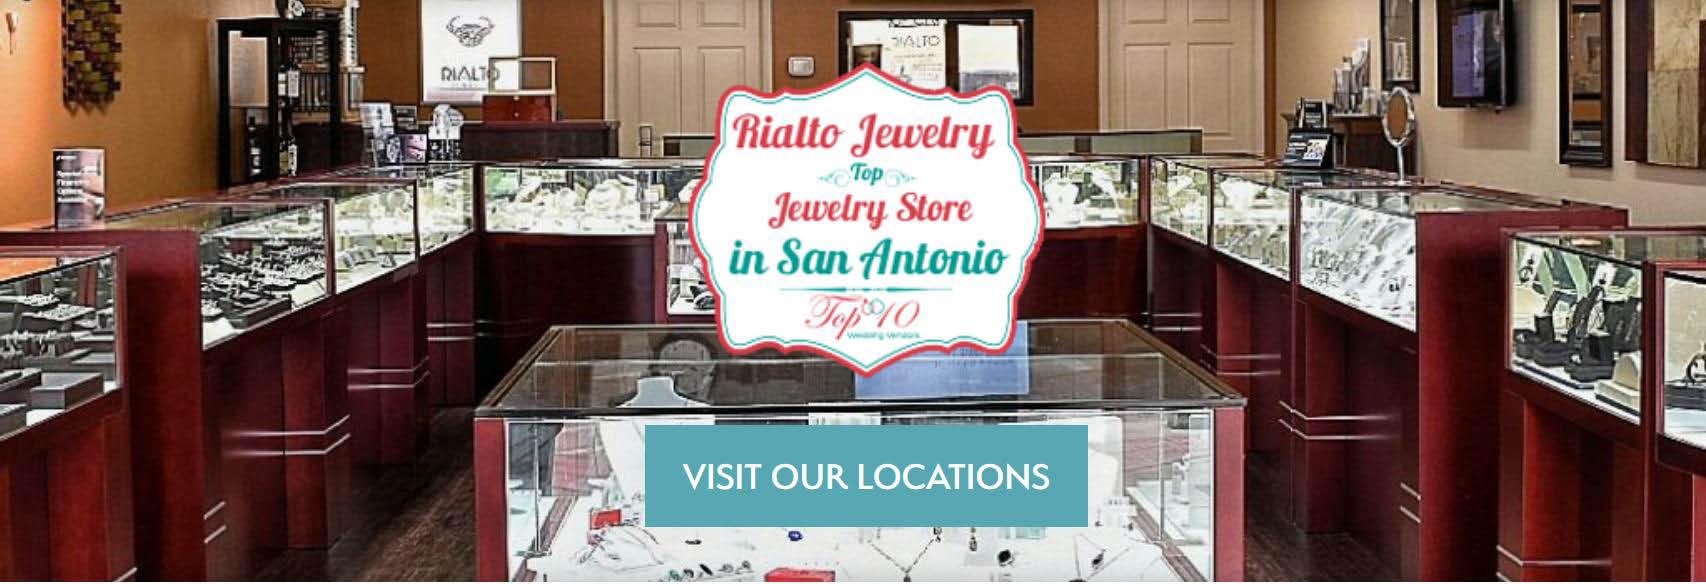 Rialto Jewelry Banner Image